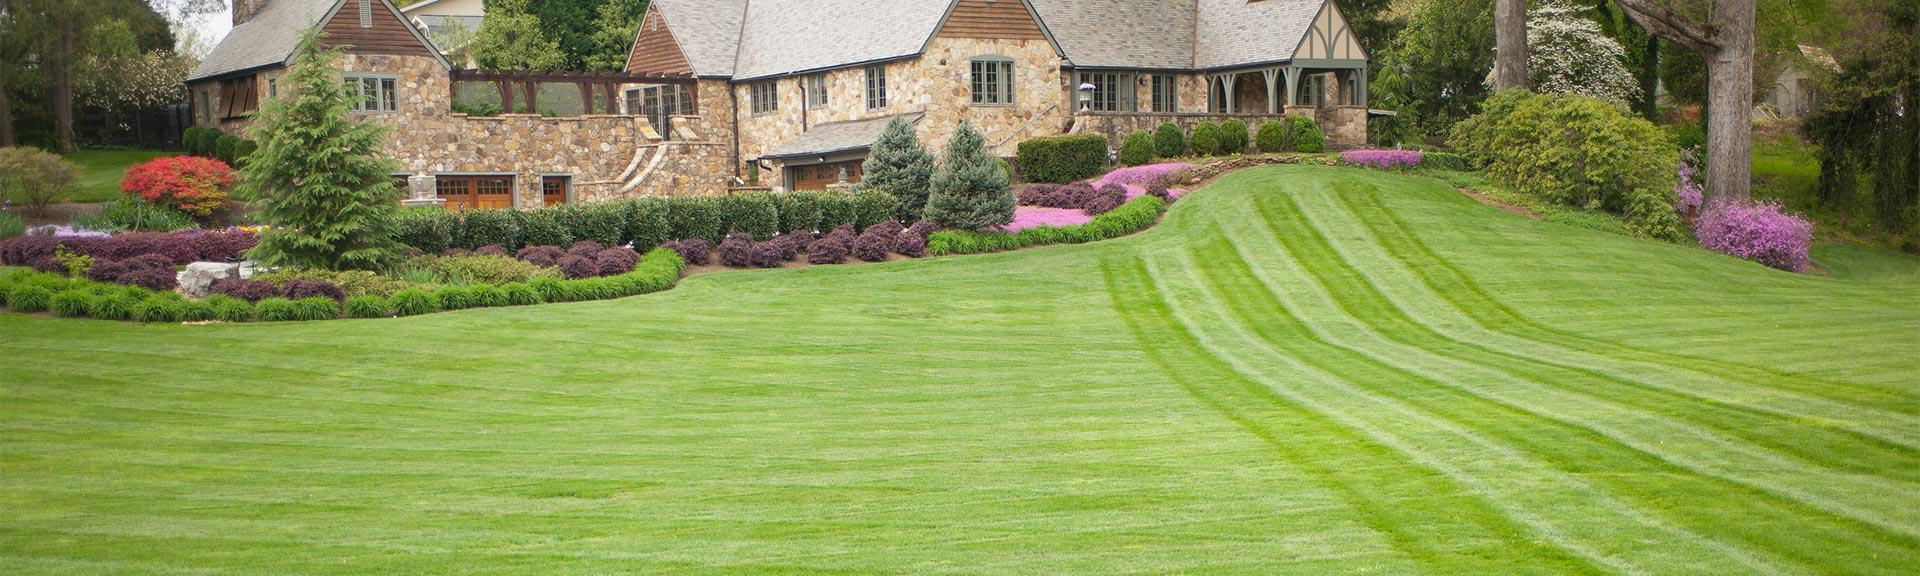 Basf Better Turf Markets Lawn Care